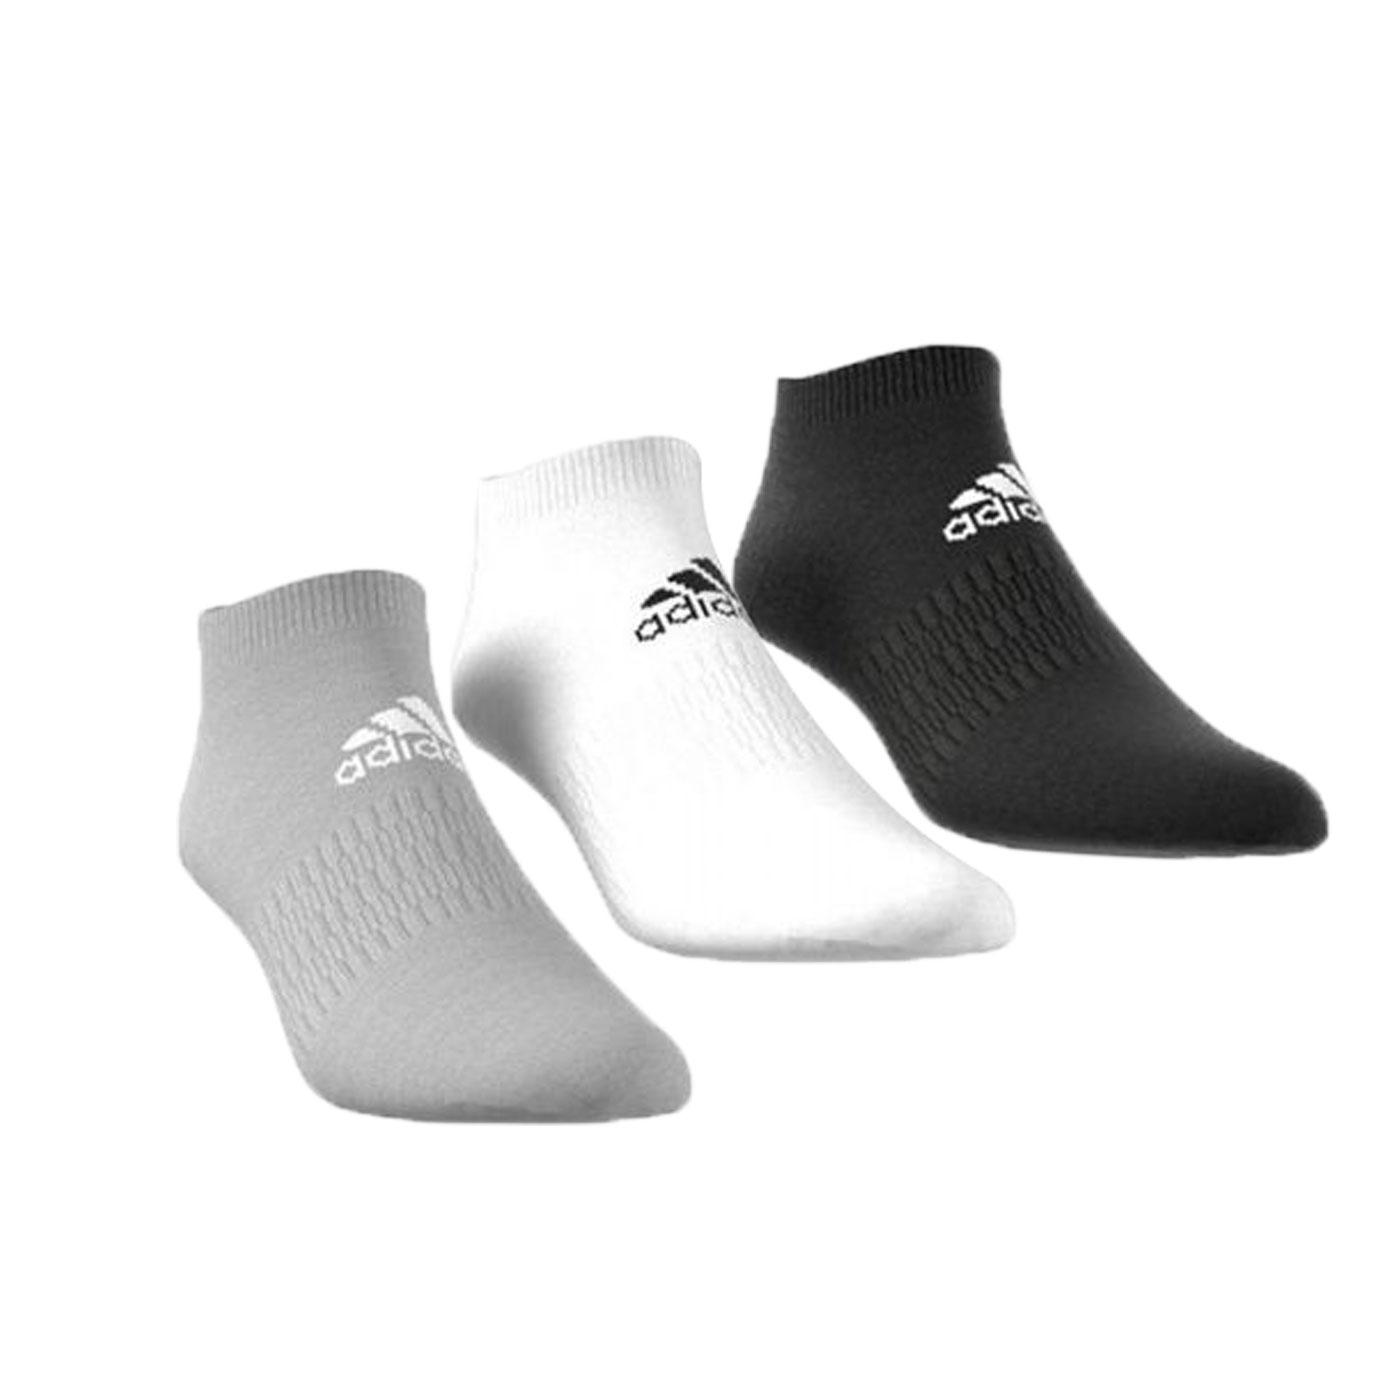 ADIDAS 運動踝襪(三雙入) DZ9400